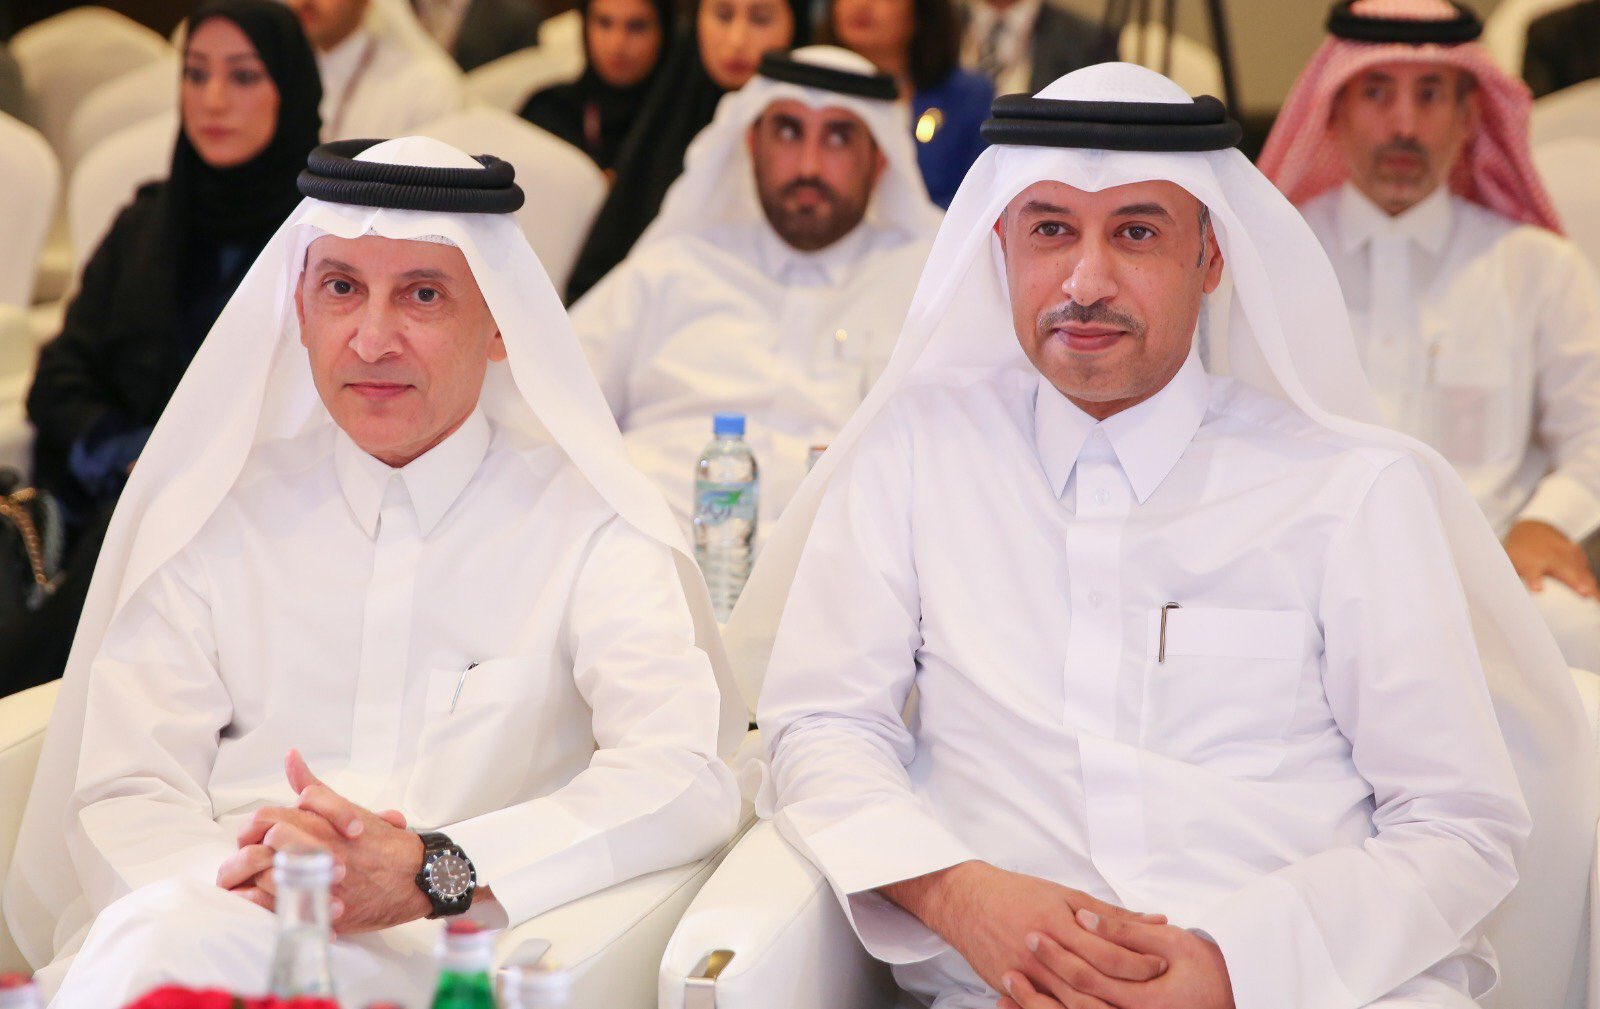 "Catalin Radu on Twitter: ""Opening of the @ICAO Forum on Combatting Human Trafficking by HE Mr. Akbar Al Baker, the @qatarairways CEO, and HE Dr. Issa Bin Saad Al Jafali Al Nuaimi,"